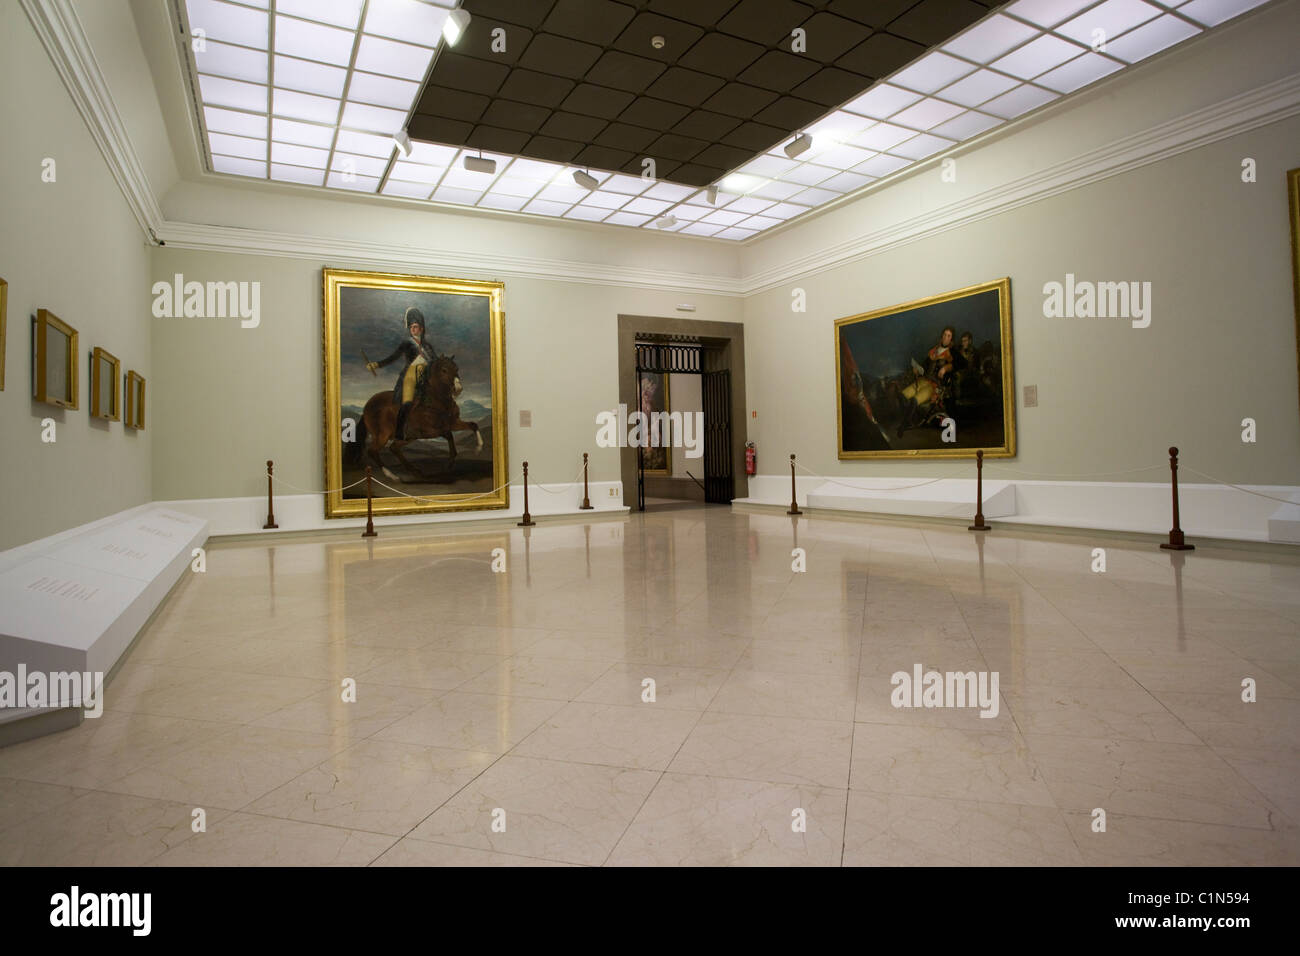 Madrid, Real Academia de bellas Artes de San Fernando, Ausstellungssaal - Stock Image